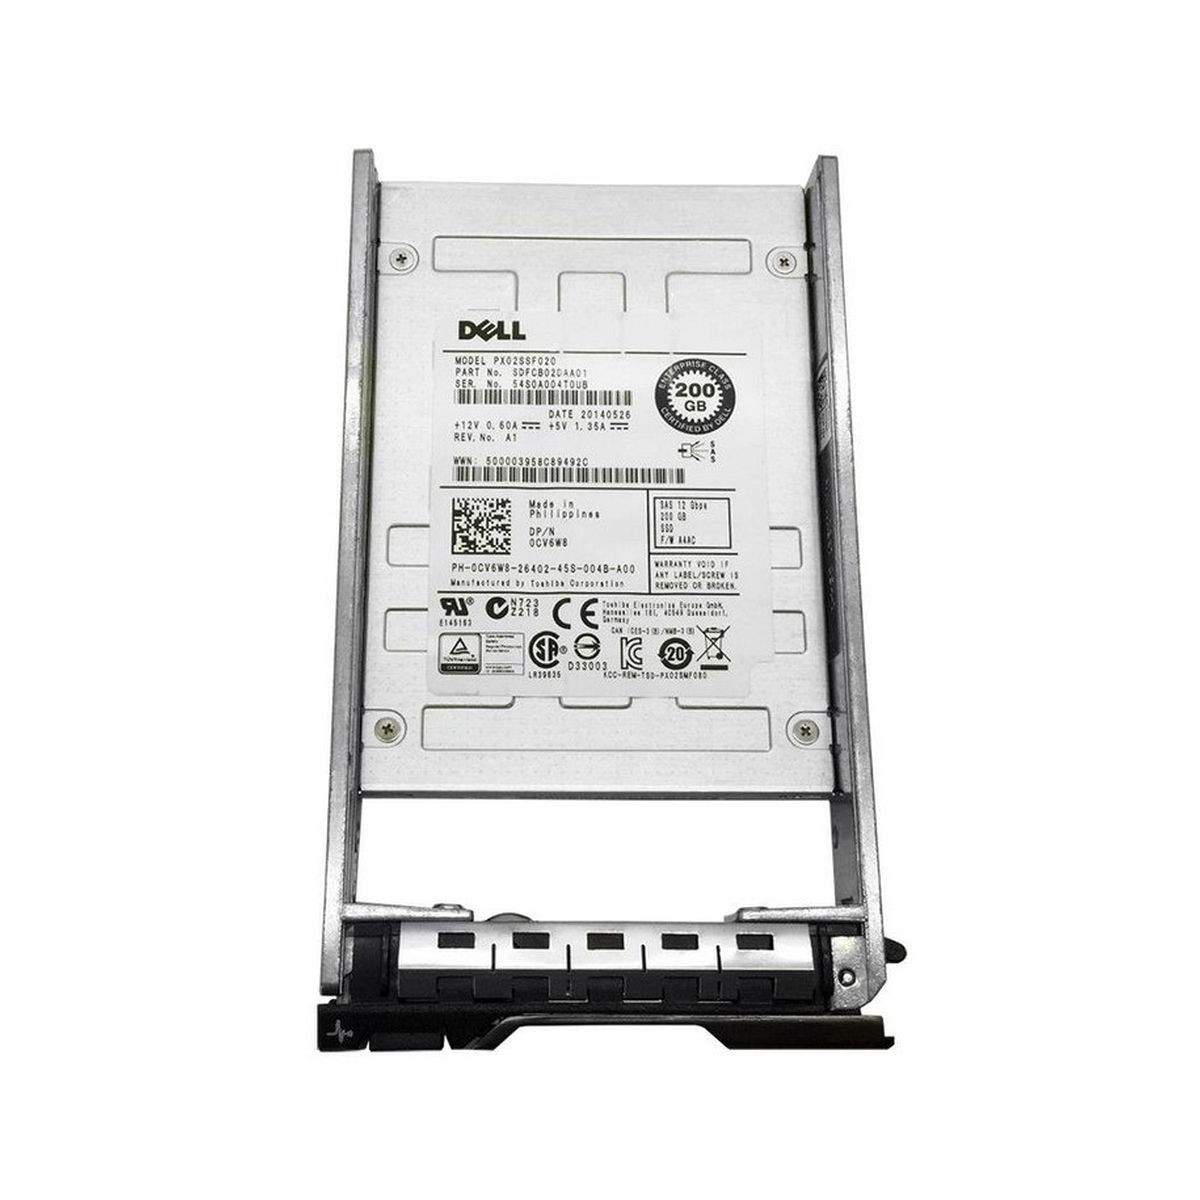 PAMIEC KINGSTON KVR800D2N6/2G 1GB DDR2 800MHZ